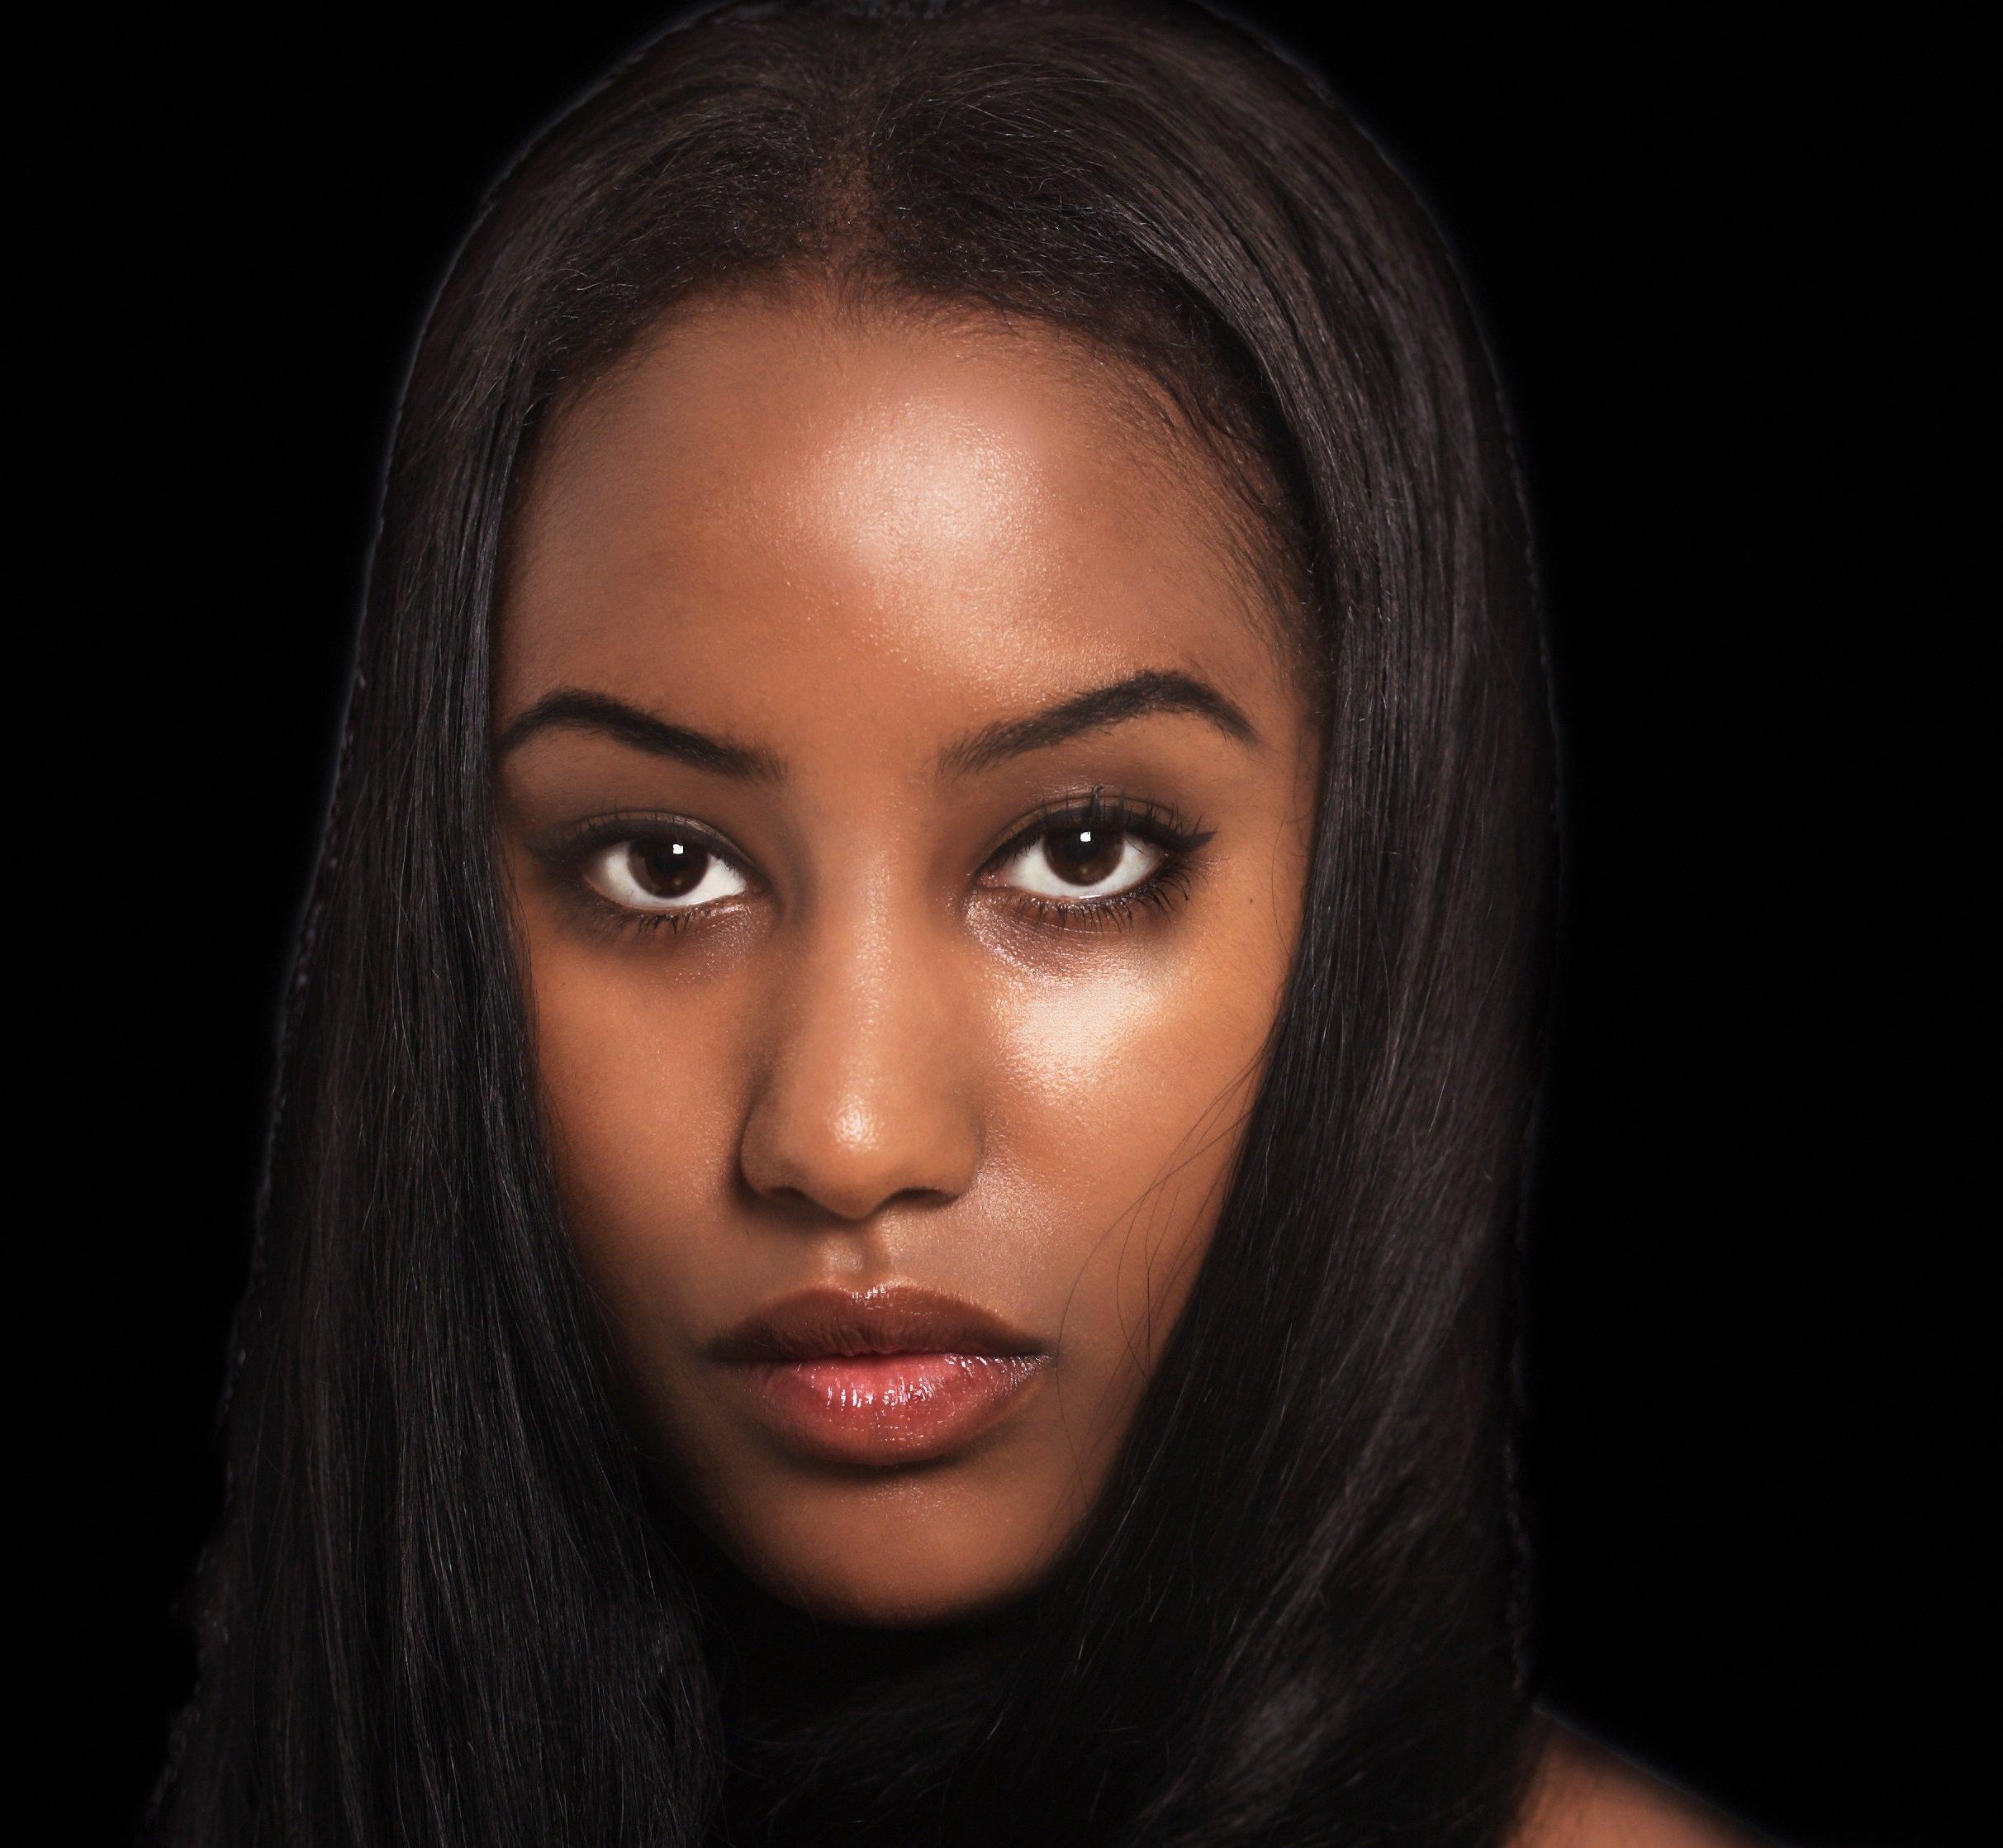 Woman expression, face portrait dark background